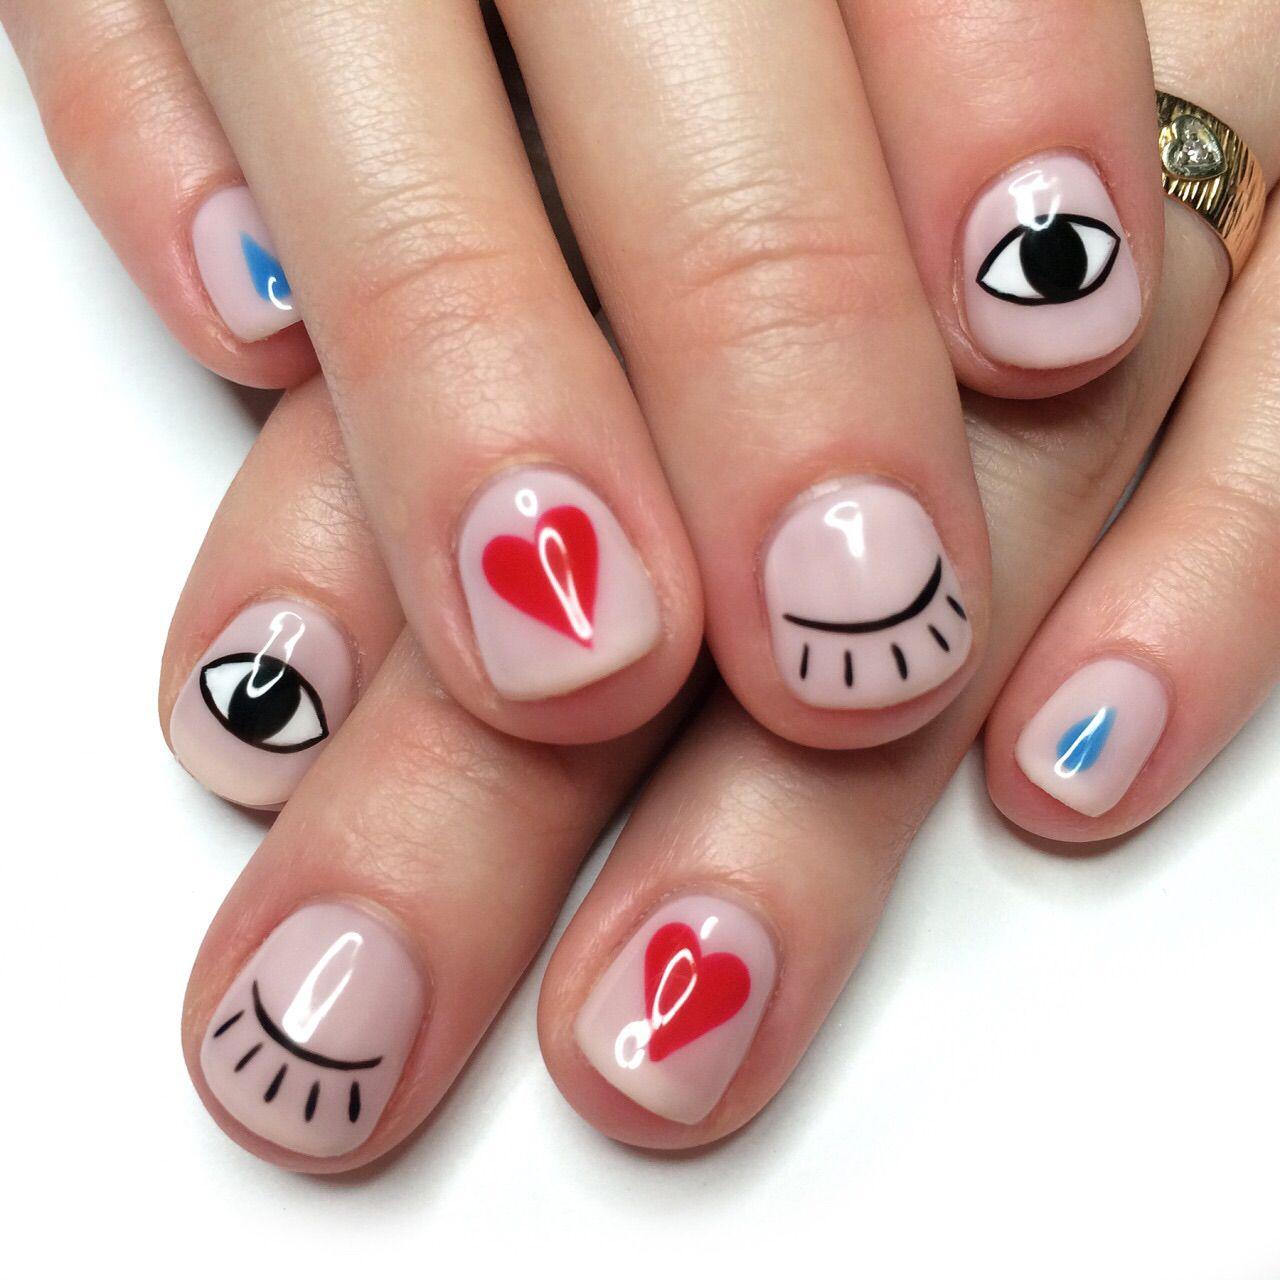 Eye nails https://noahxnw.tumblr.com/post/160769128431/decorate ...